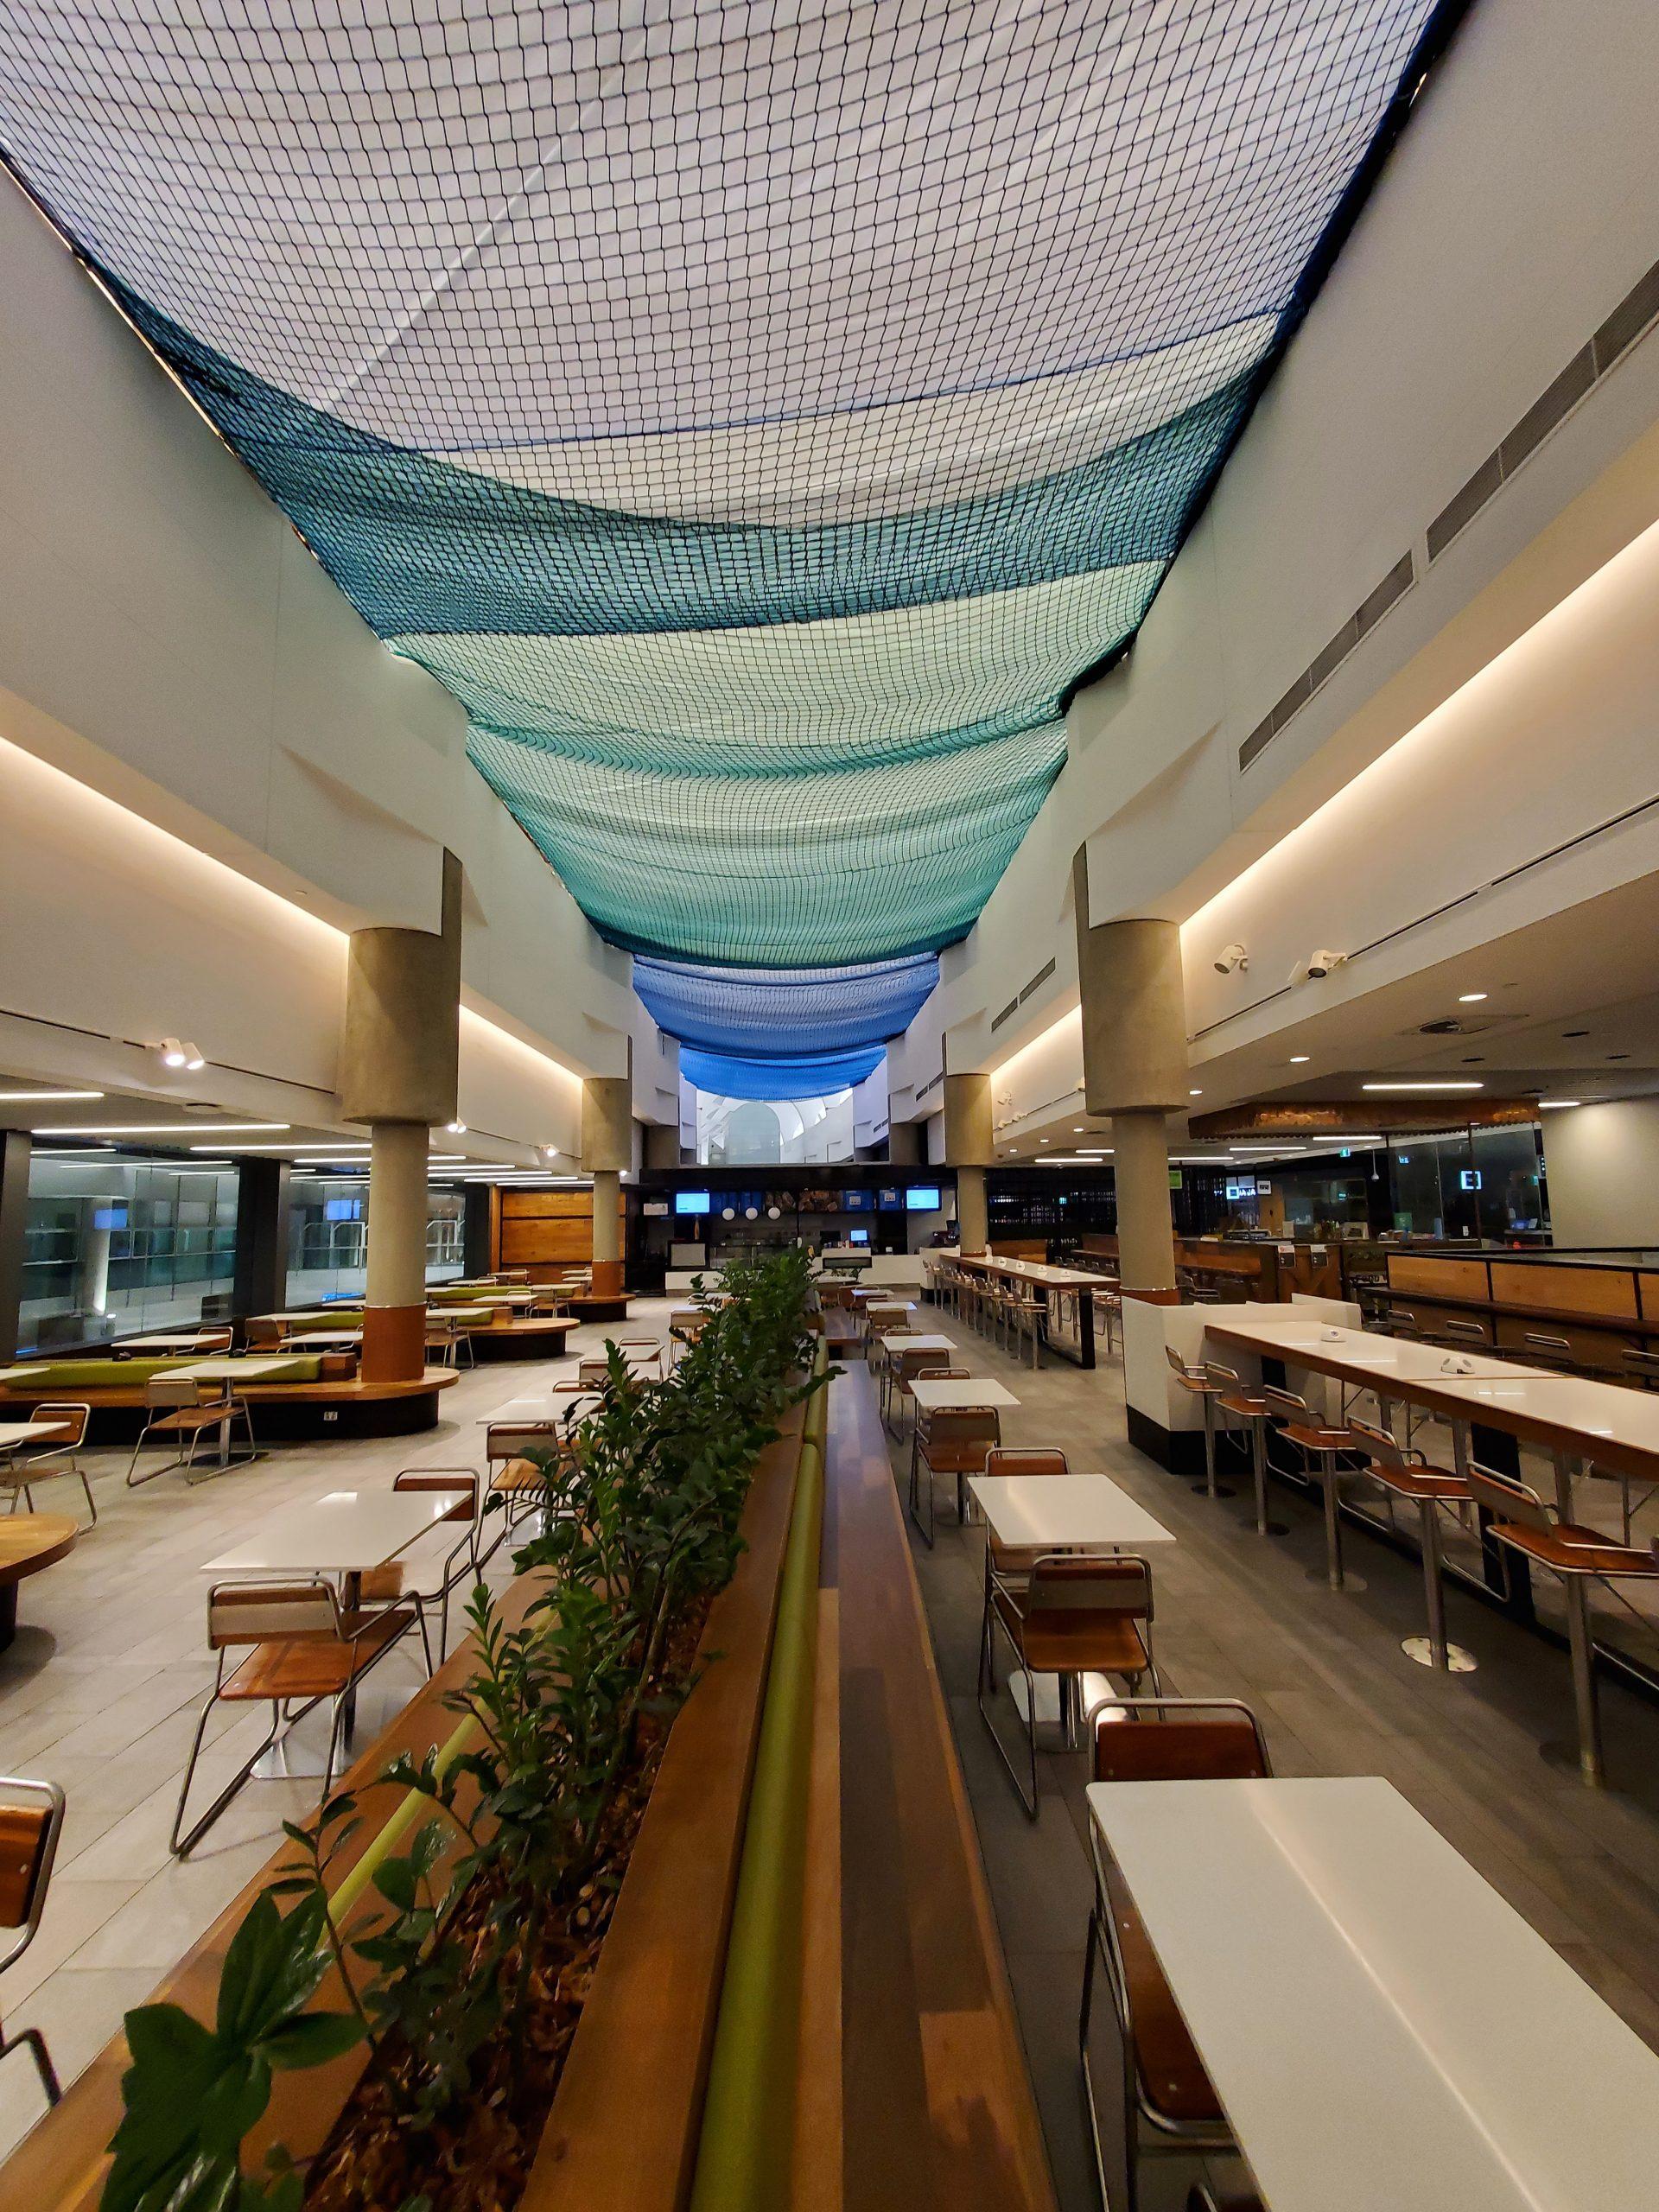 brisbane airport roof with mesh netting